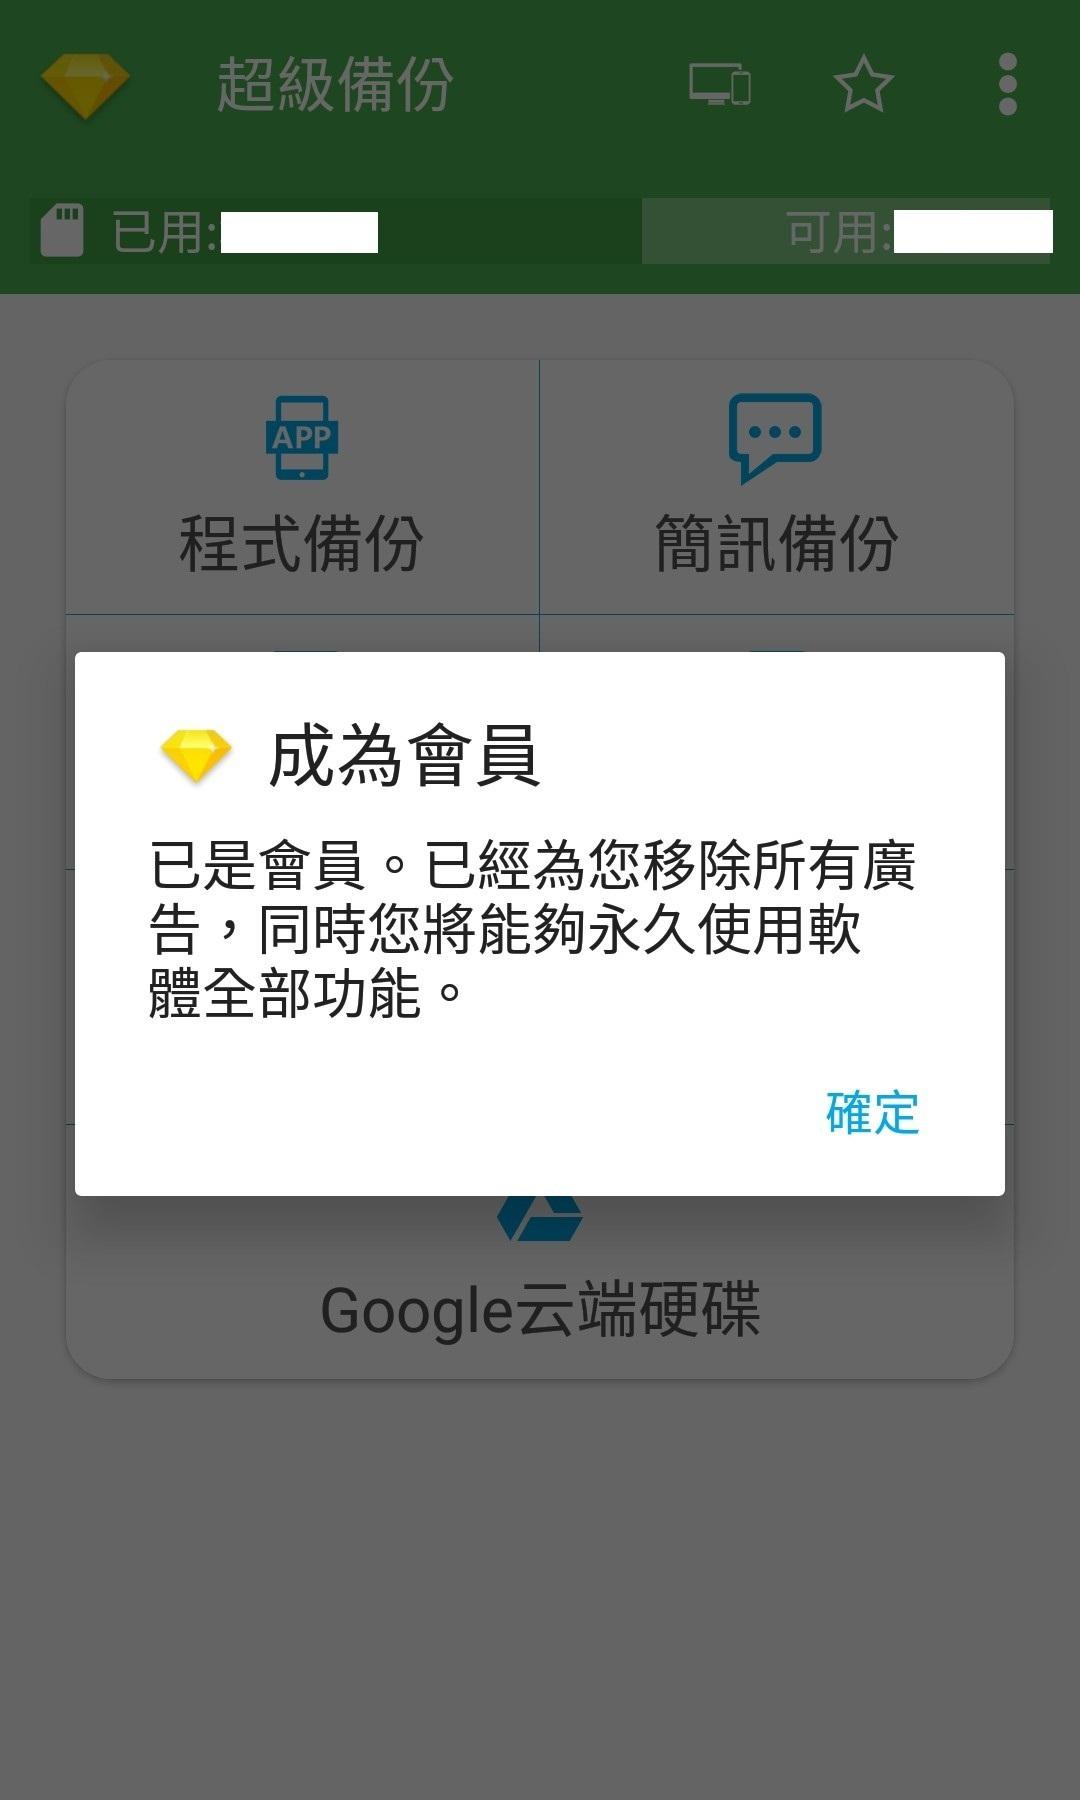 超級備份 Super Backup & Restore Premium v2.2.82 b144 繁體中文高級功能解鎖版 - Android 遊戲.應用下載 - 冰楓論壇 - 綜合 ...